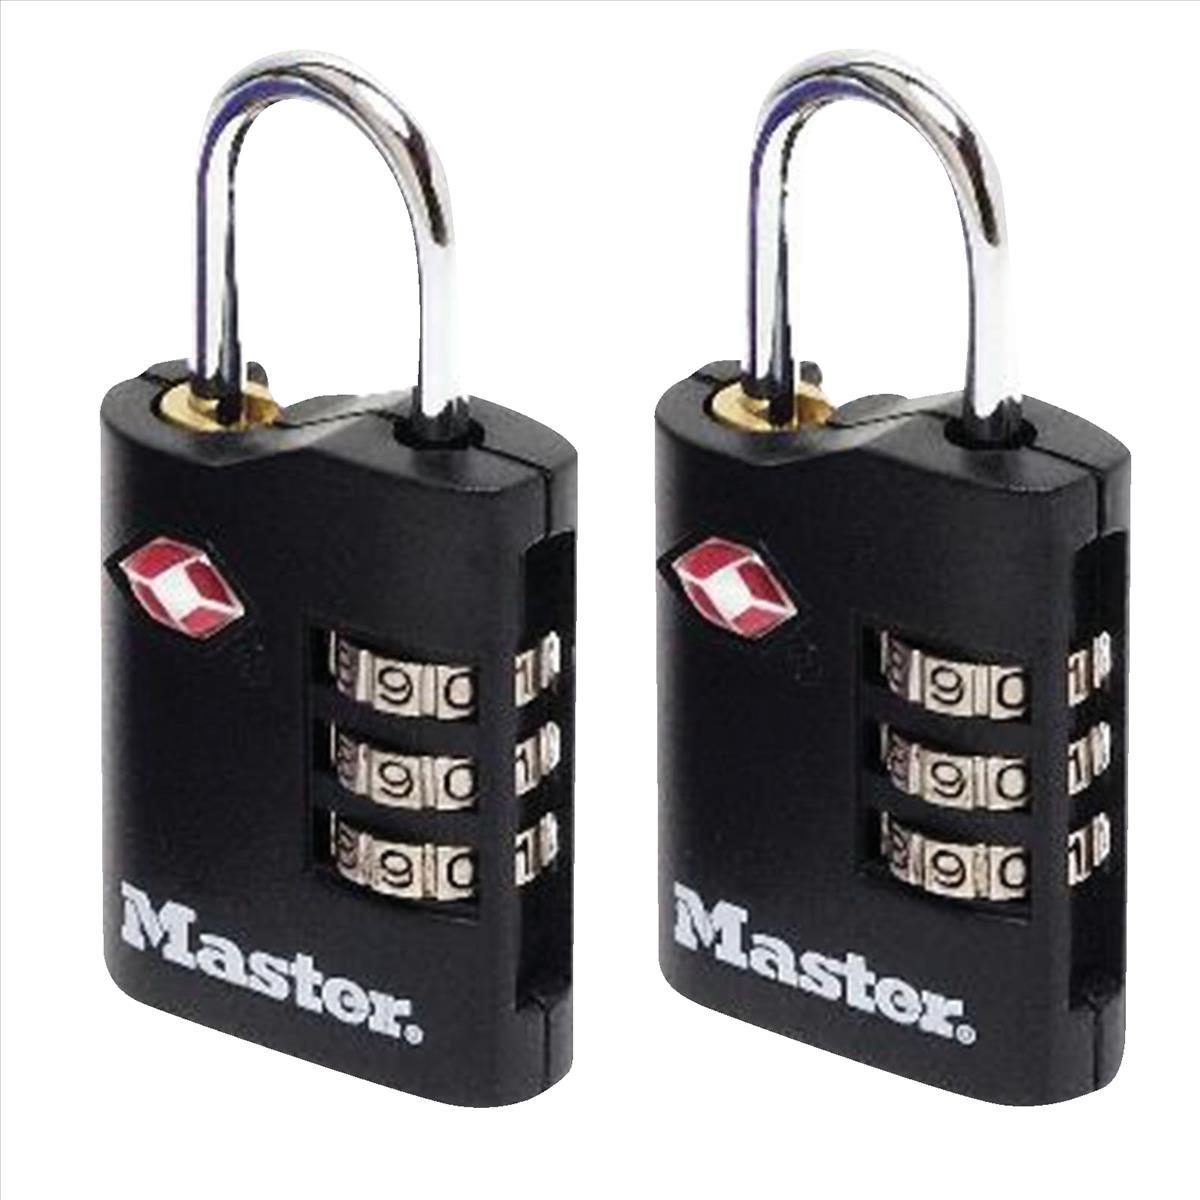 Masterlock Combination Padlock 3 Digit ABS TSA Certified 2x30mm Ref RY40046 [Pack 2]